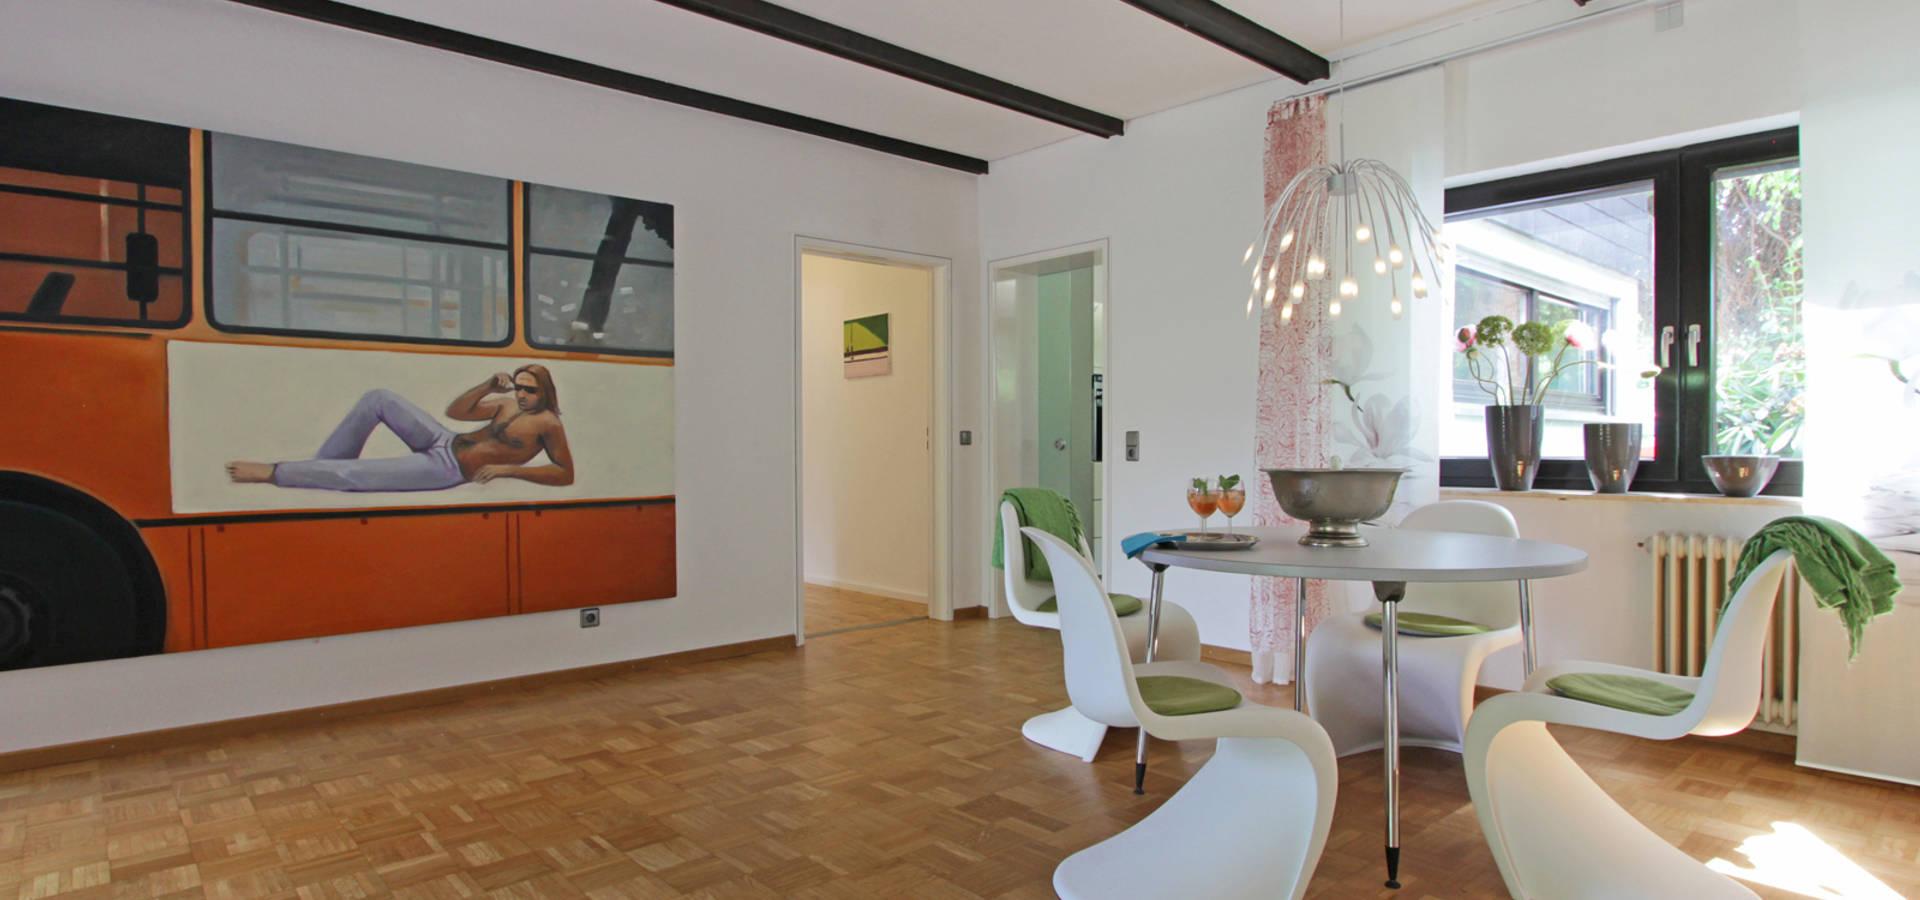 homestaging projekt wintergarten von hausundso immobilien offenburg homify. Black Bedroom Furniture Sets. Home Design Ideas